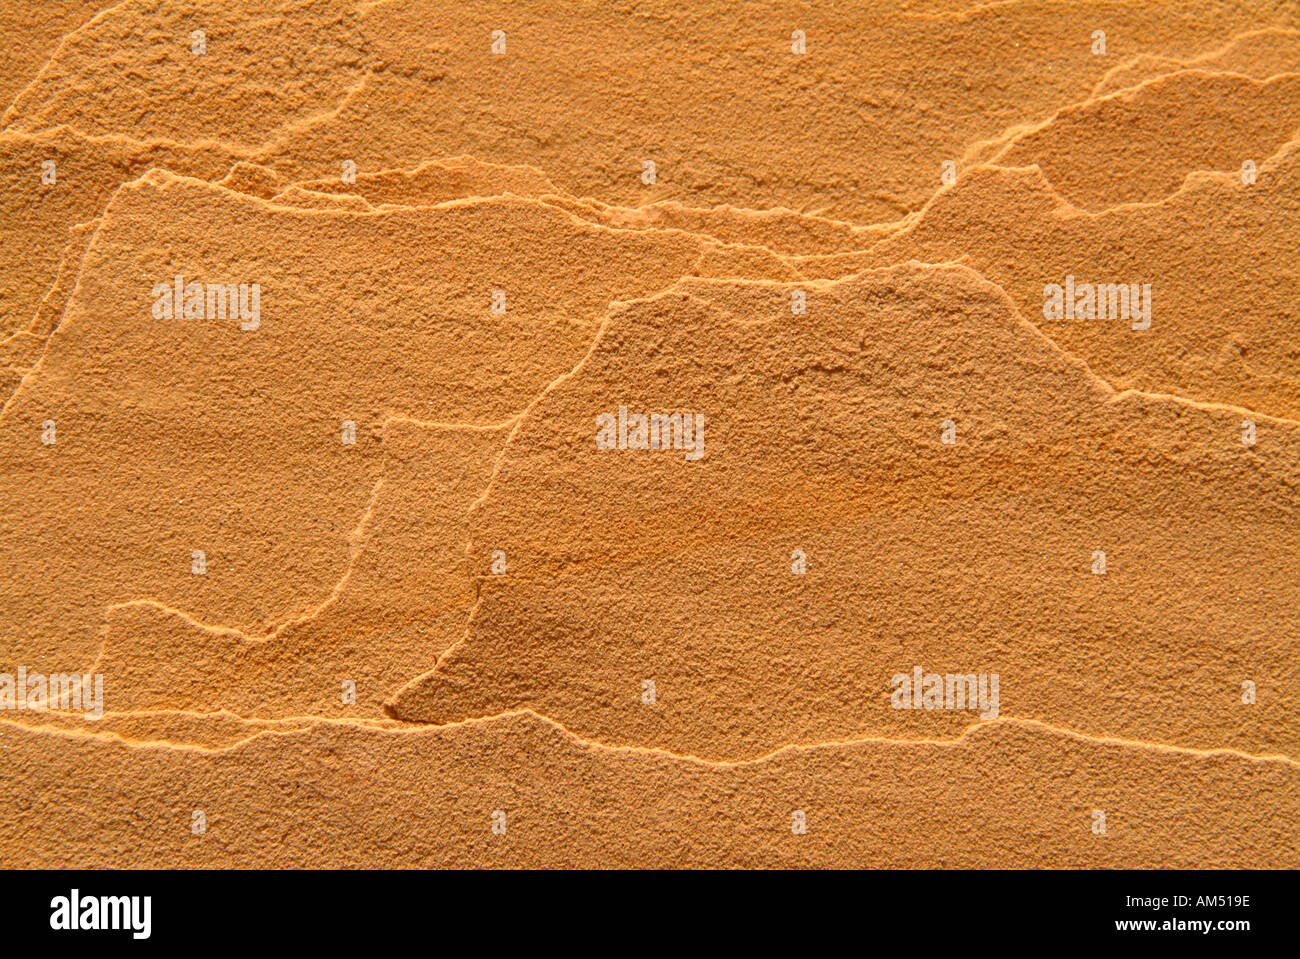 Antecedentes de arenisca en capas de color naranja Imagen De Stock